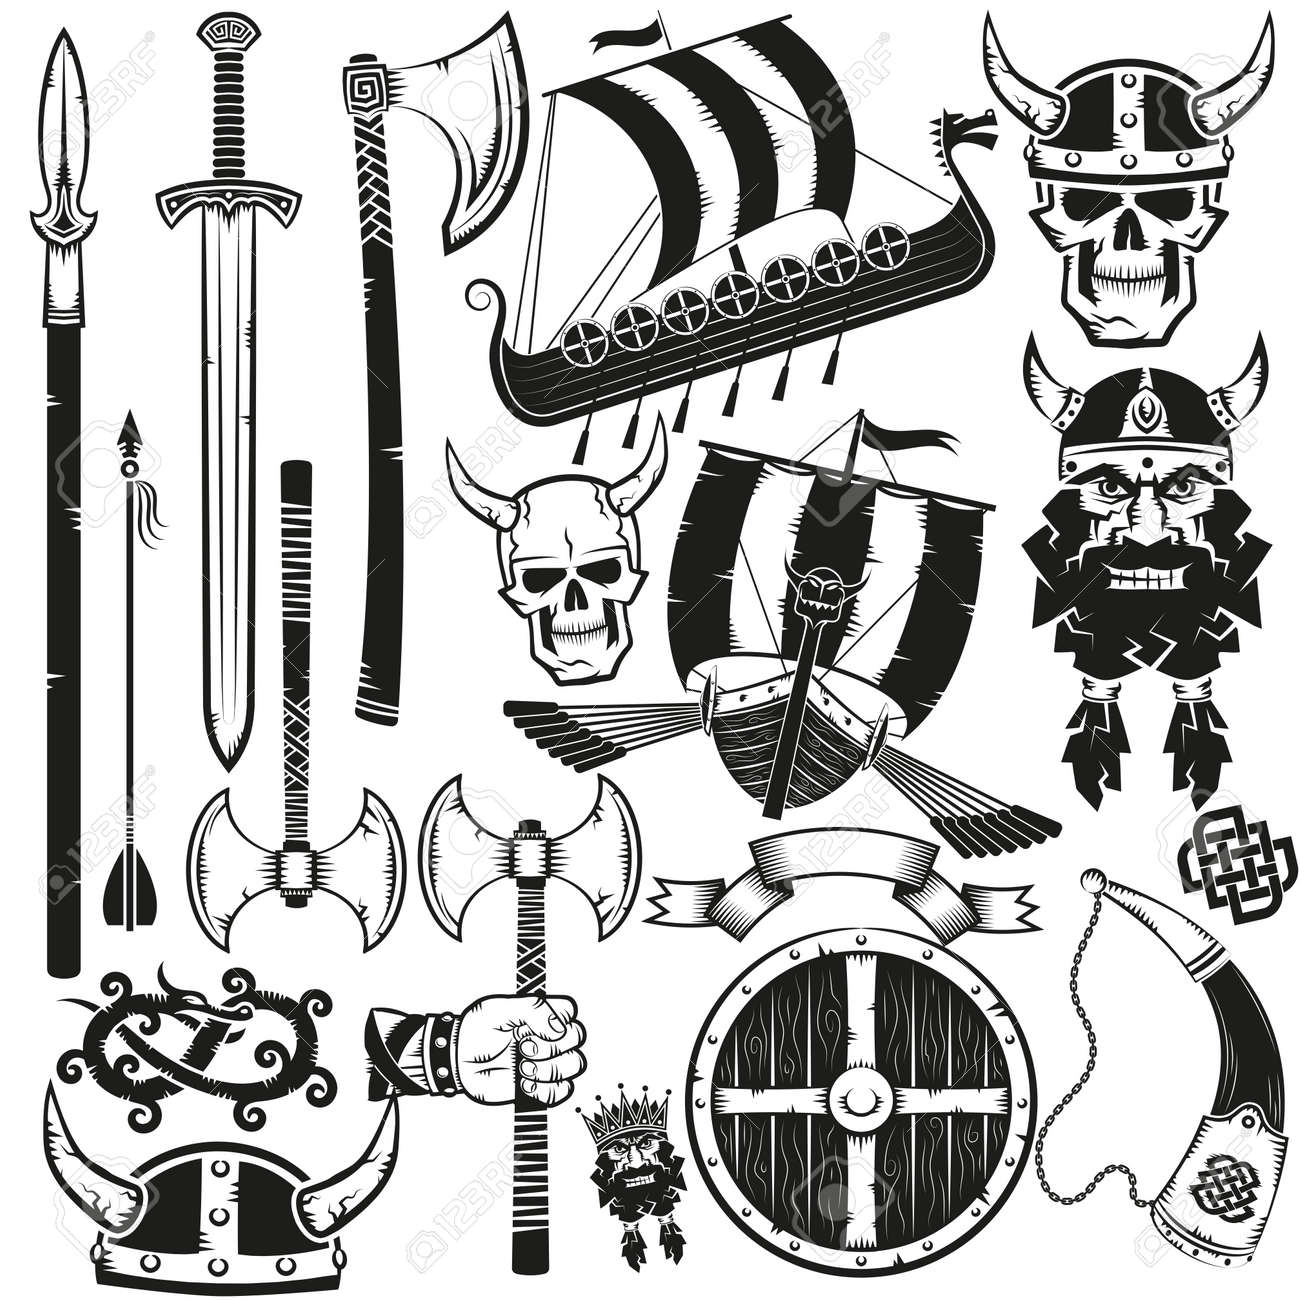 Viking Items Bundle Black On White Background Stock Photo Picture And Royalty Free Image Image 125670592